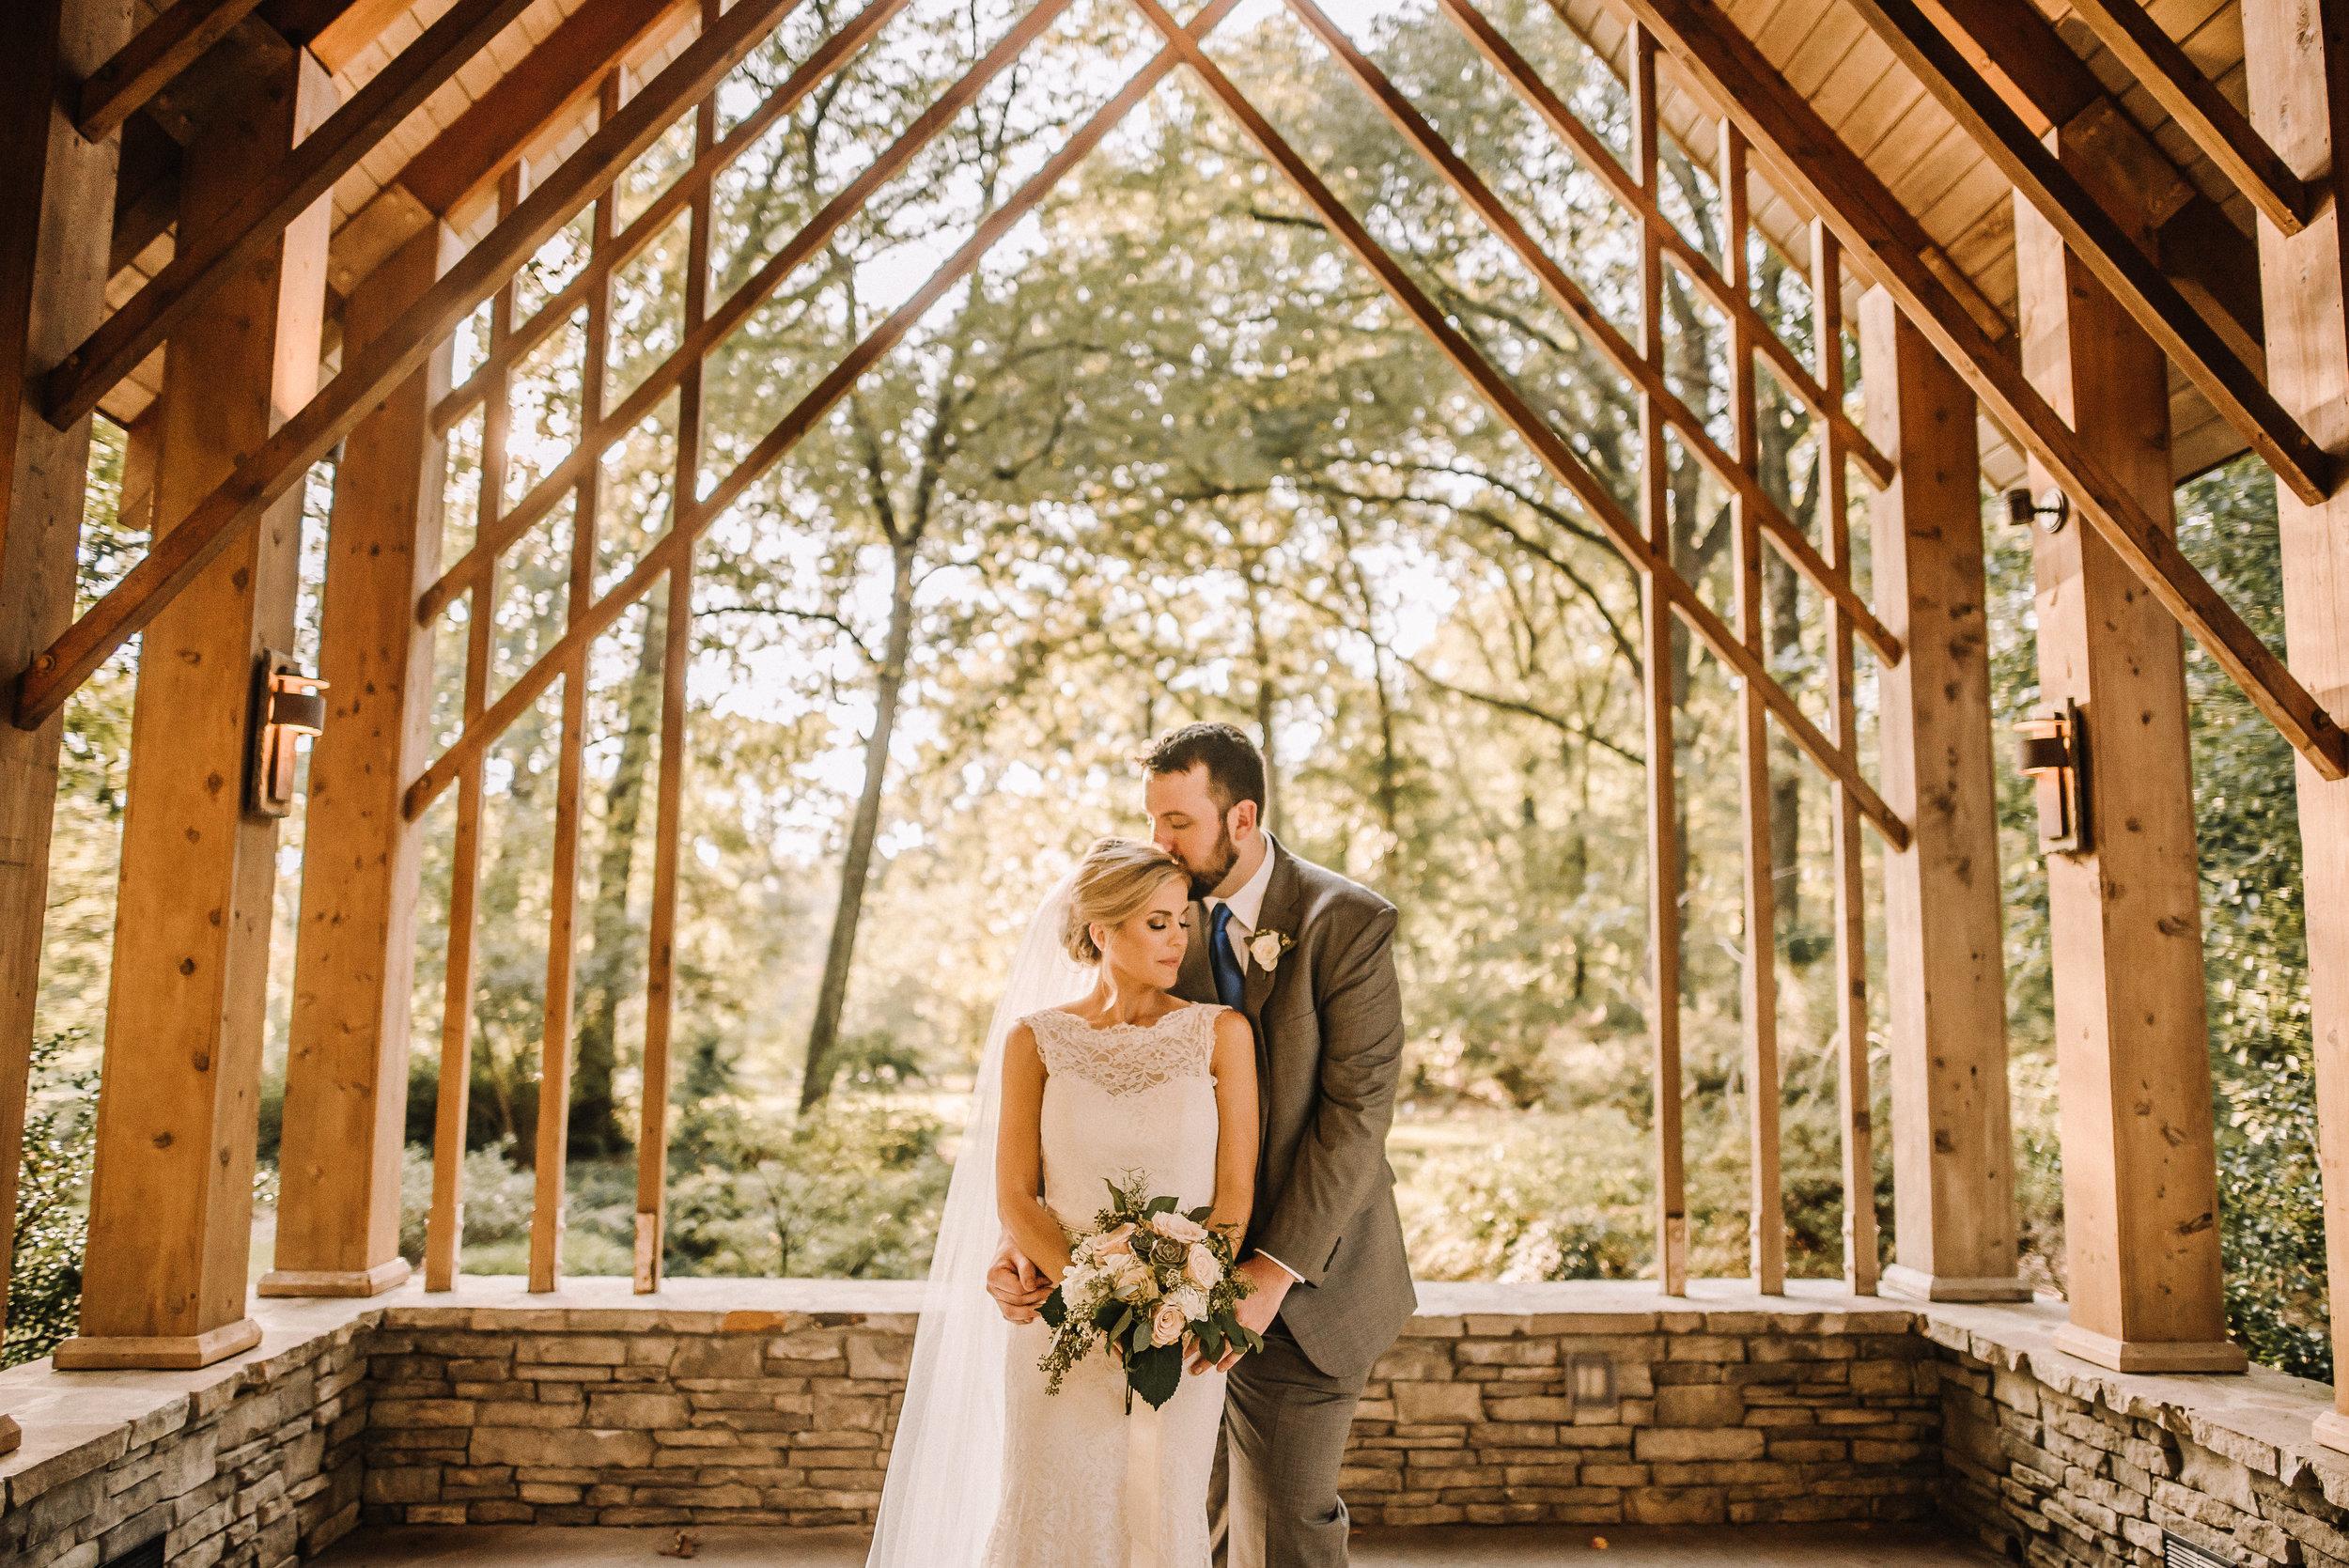 O'Brien-Wedding_Botanic-Gardens_Ashley-Benham-Photography-465.jpg